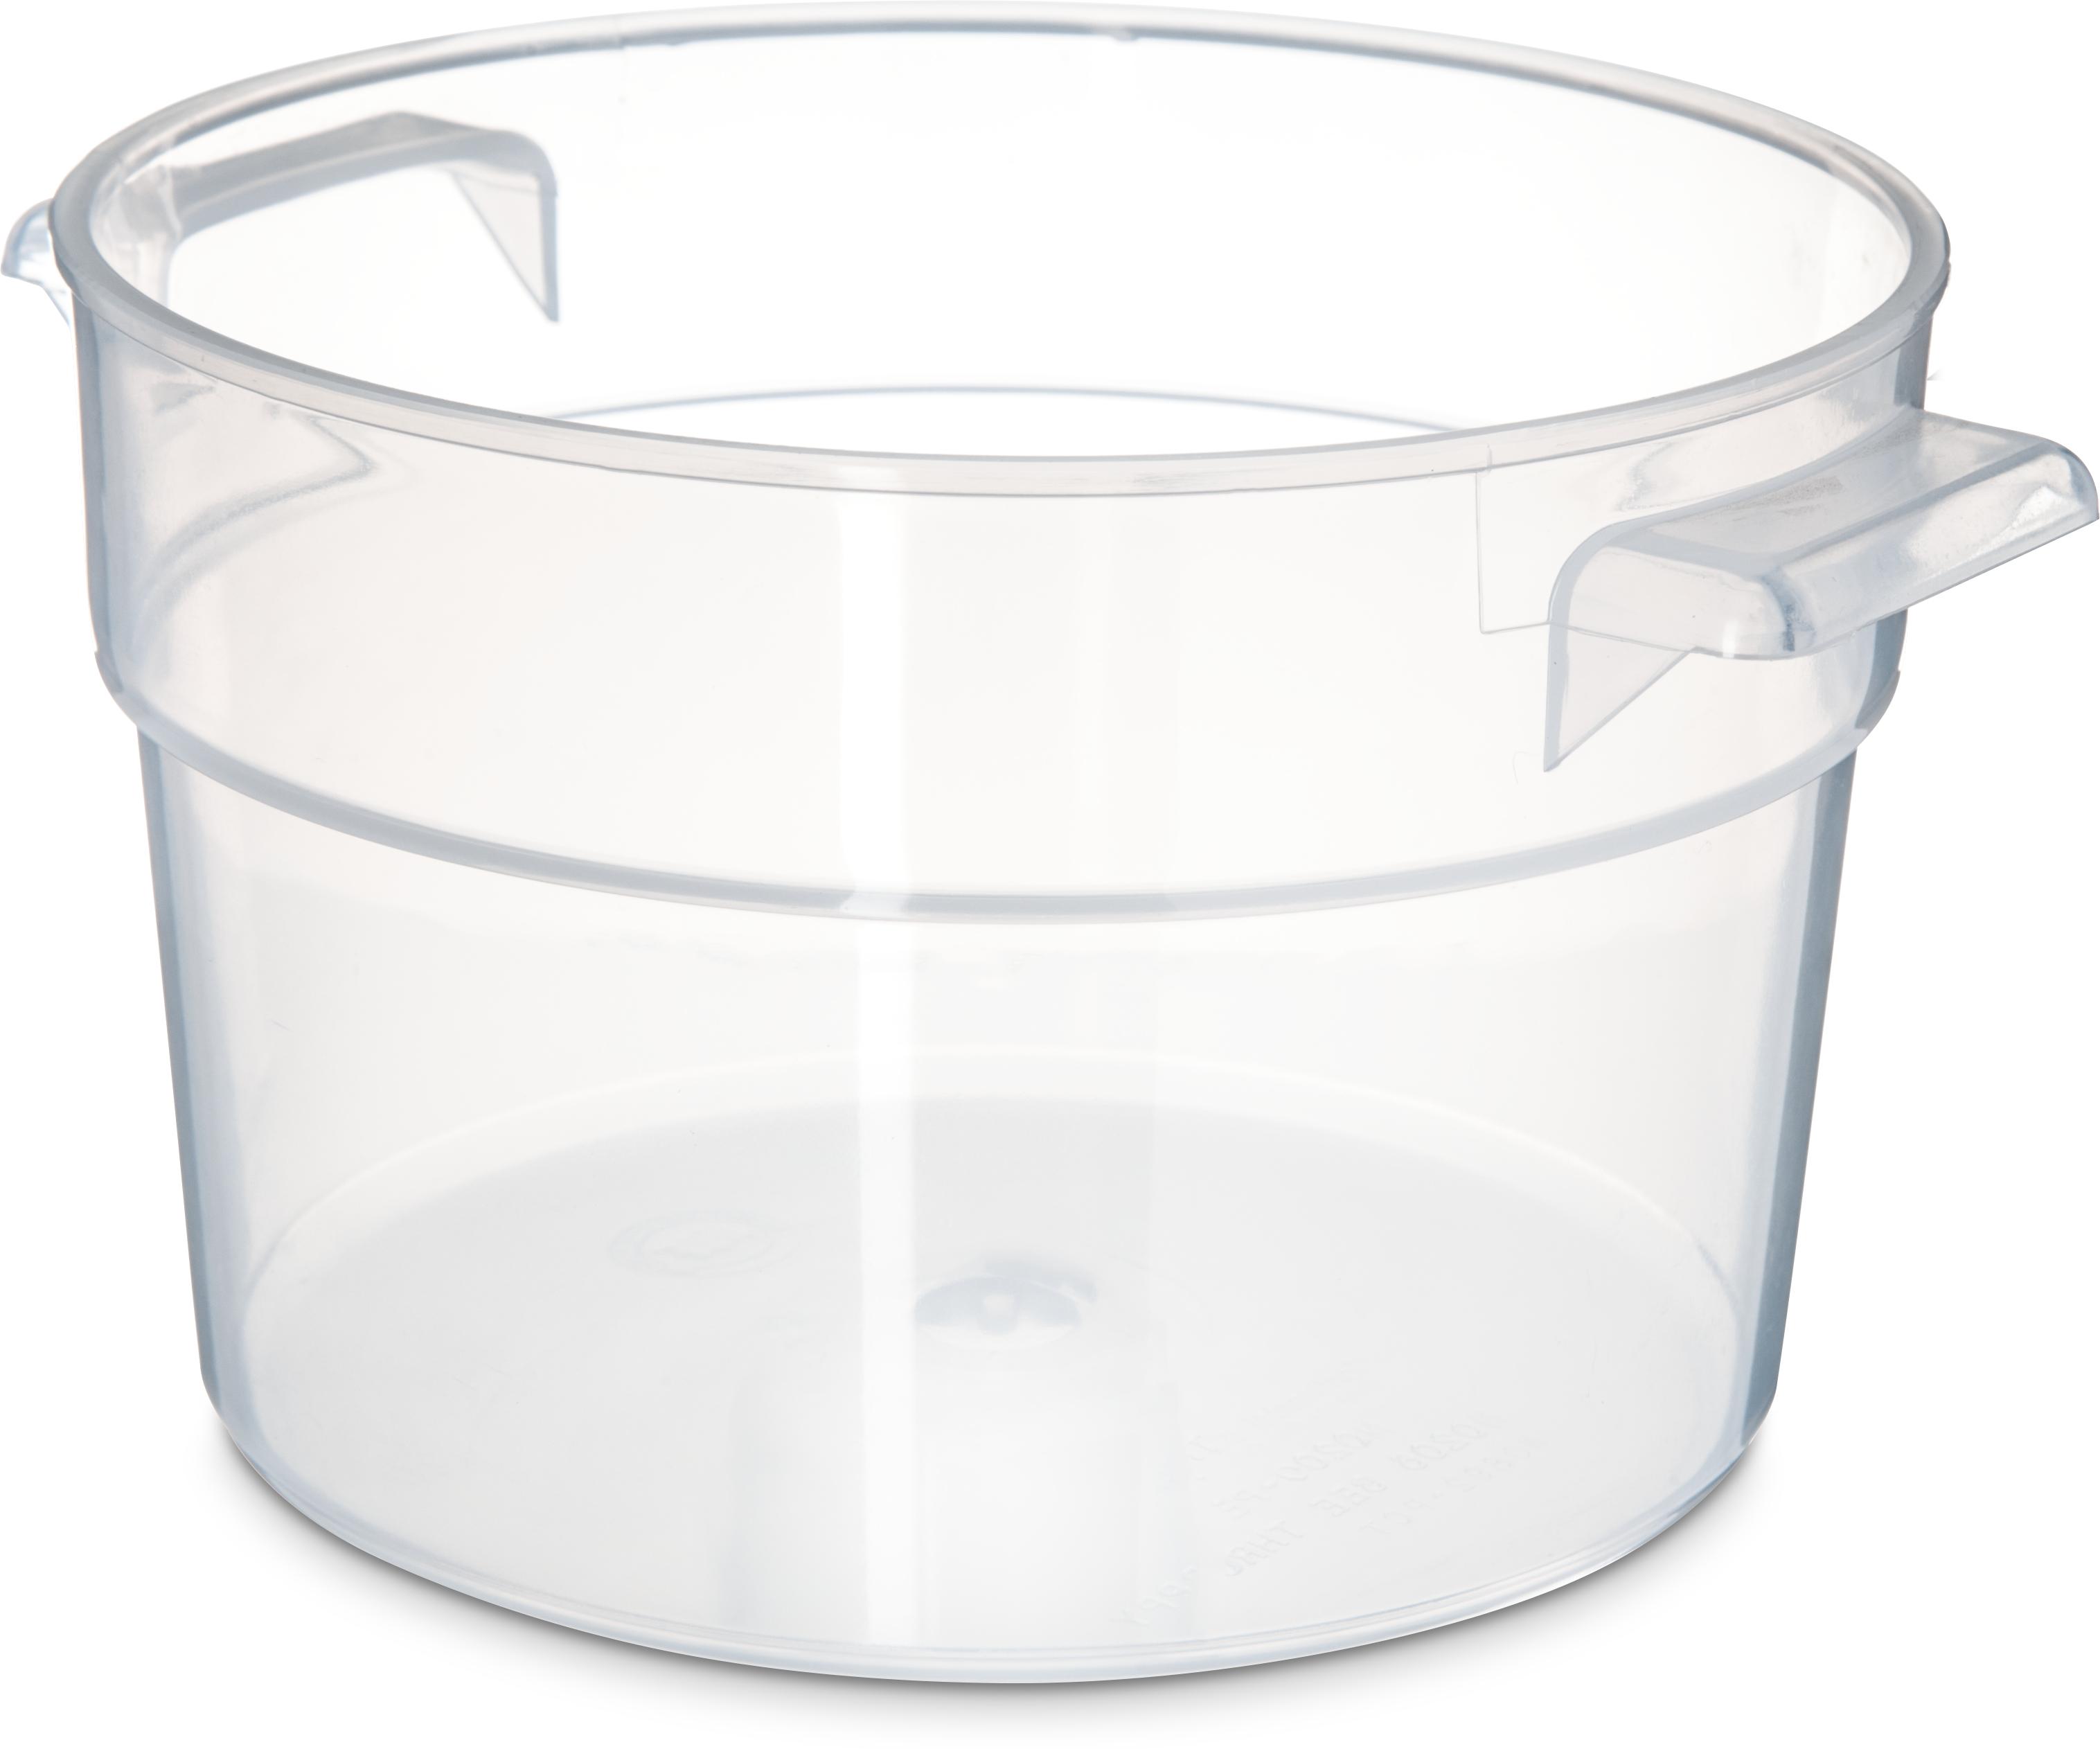 Bains Marie Container 2 qt - Translucent